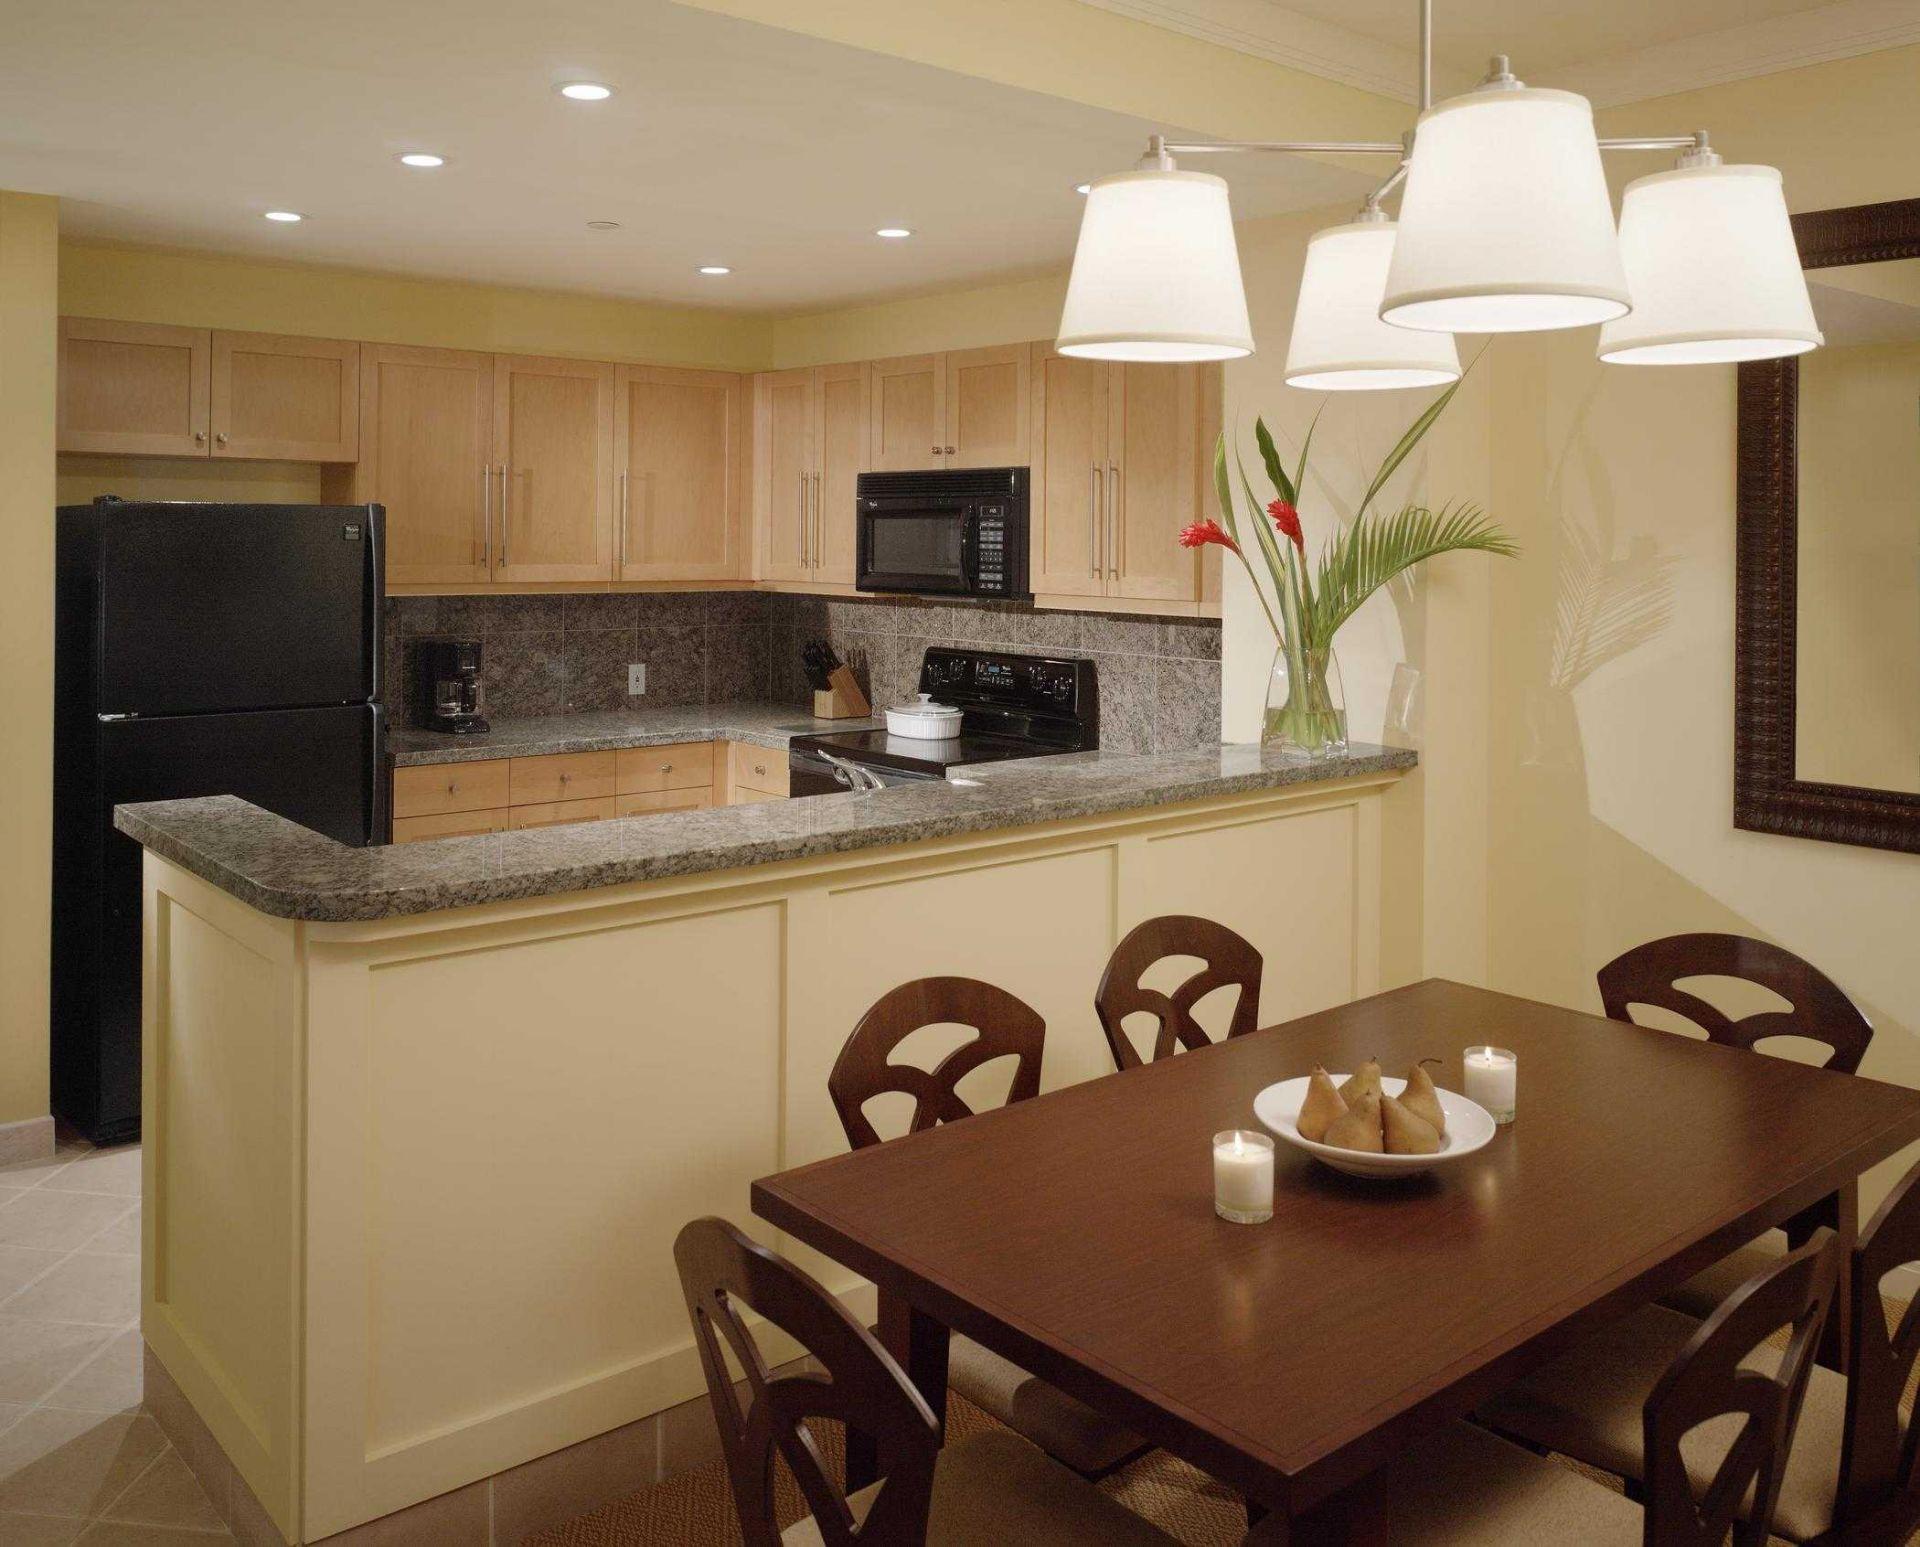 maui hotels with kitchens professional kitchen oven westin kaanapali ocean resort villa hawaii vacation